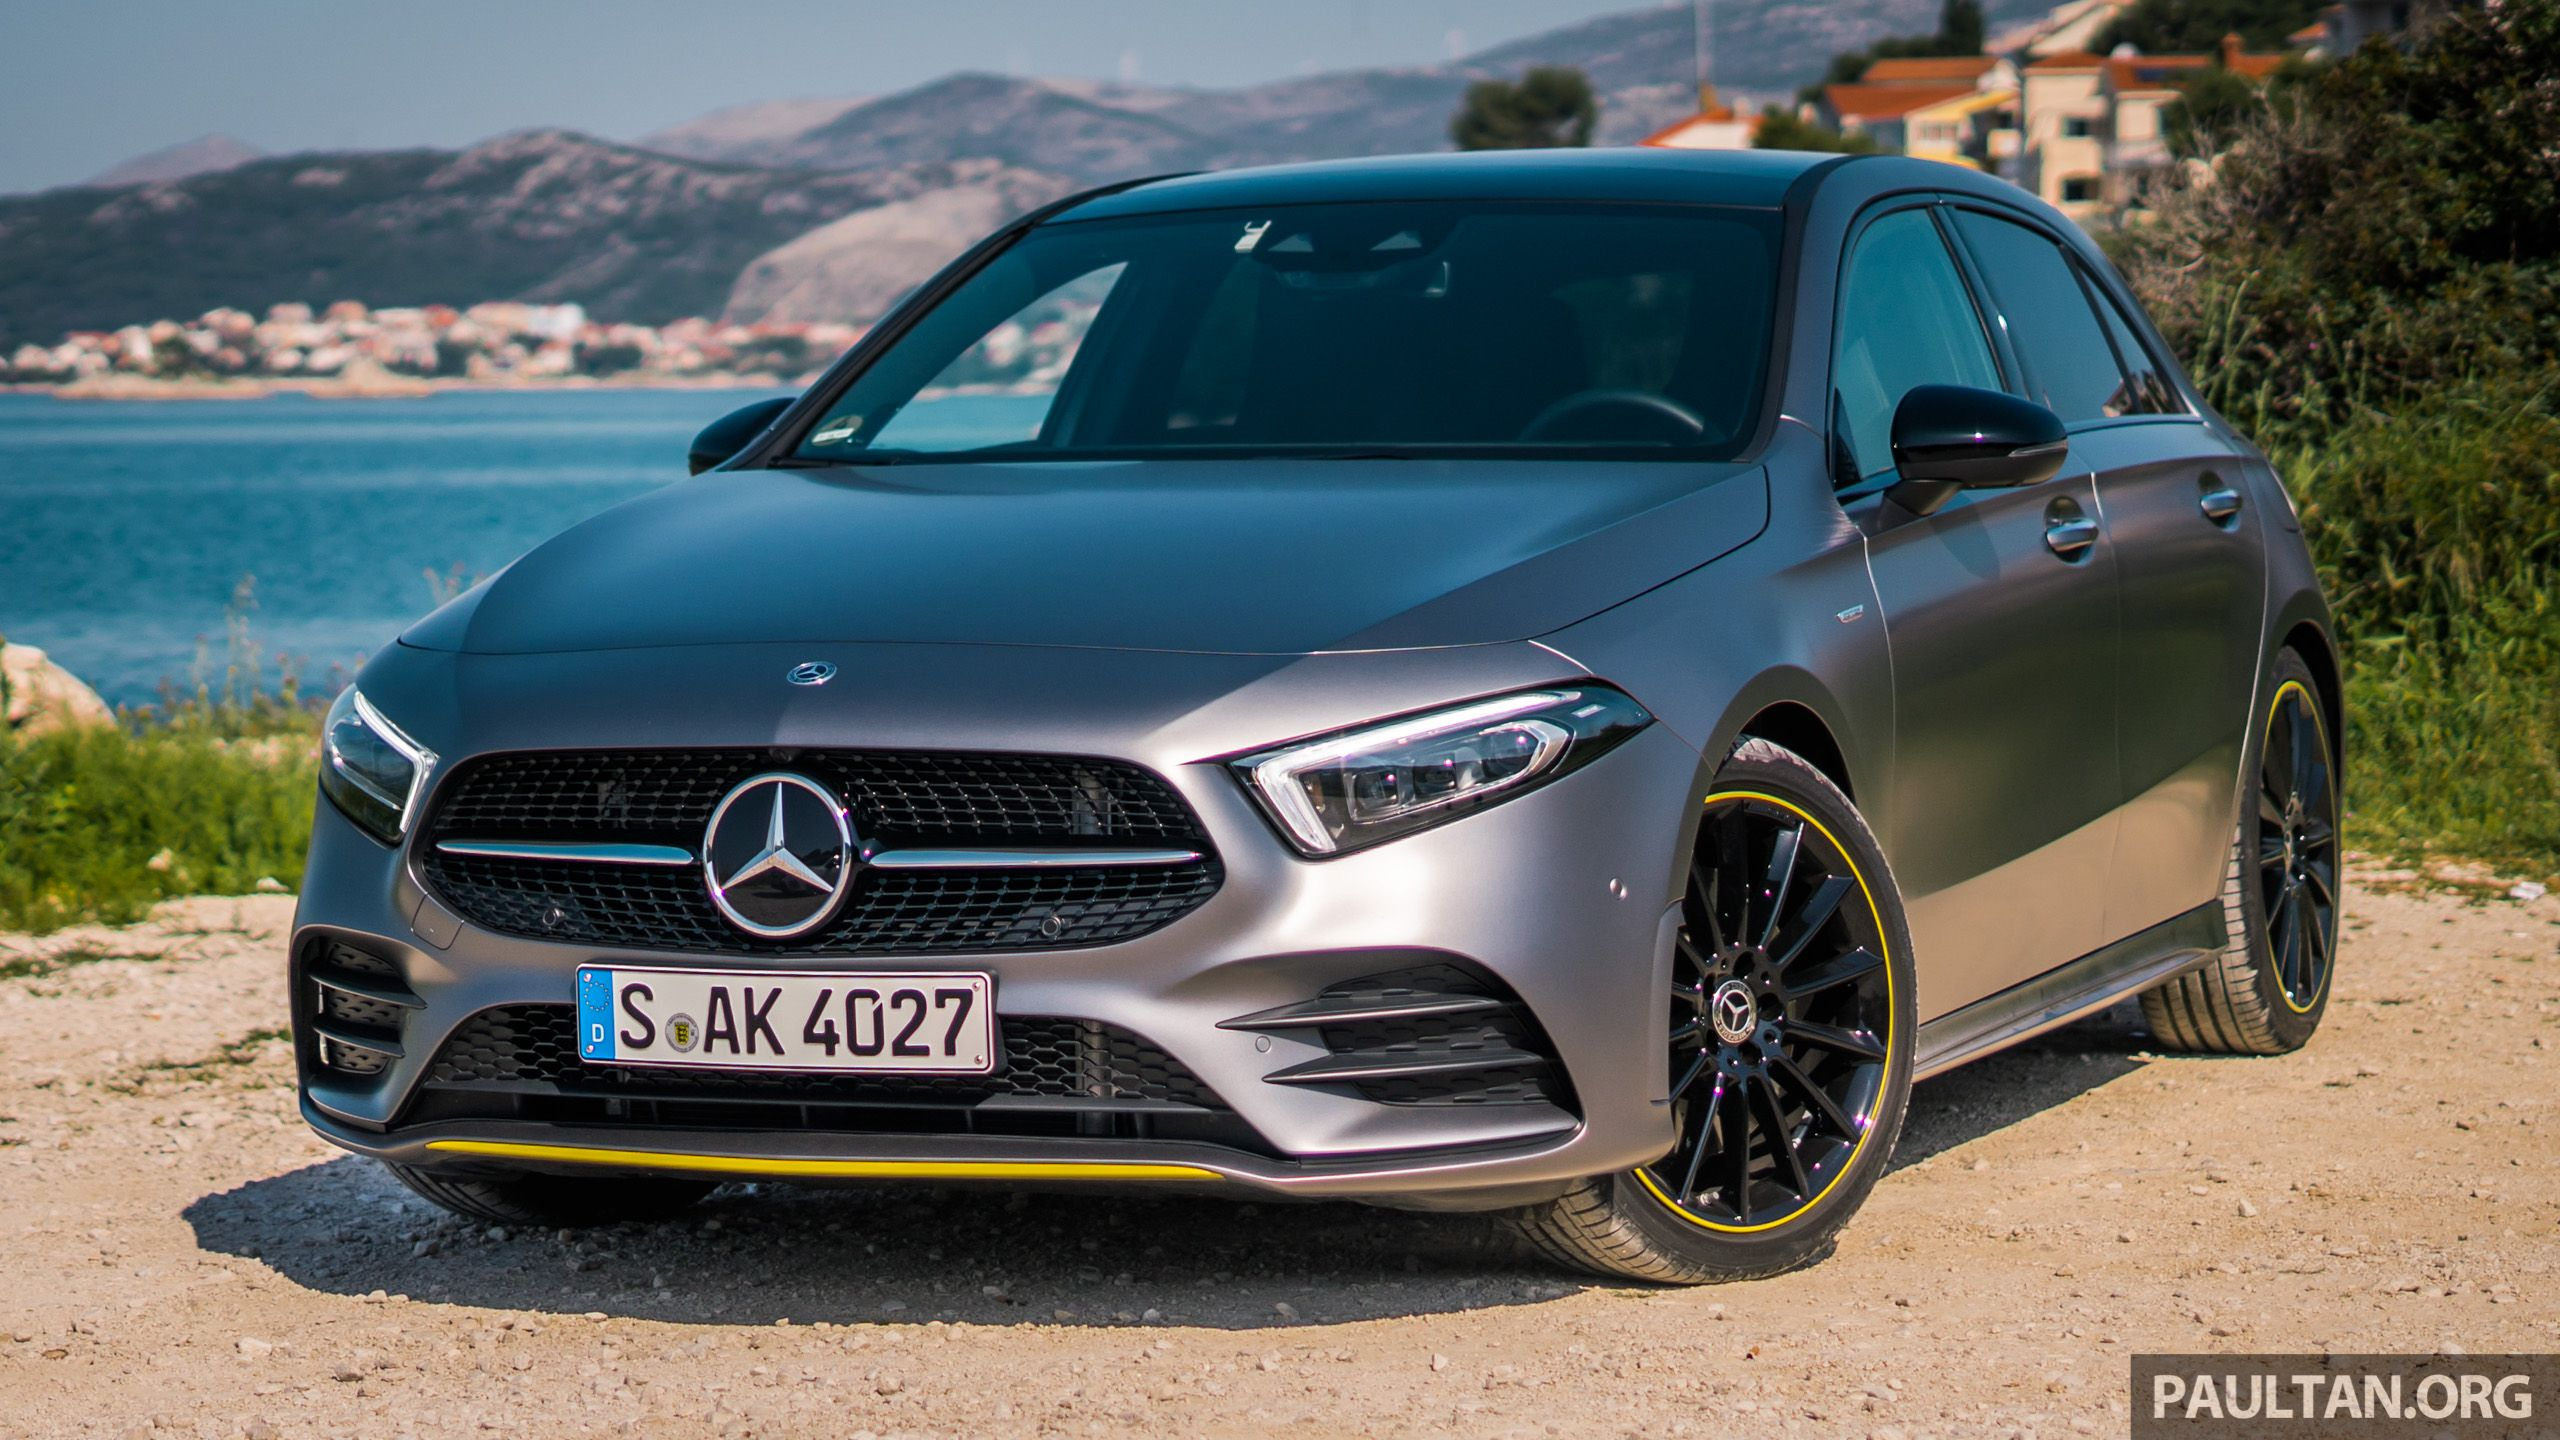 Mercedes-Benz A250e plug-in hybrid to debut soon - paultan.org